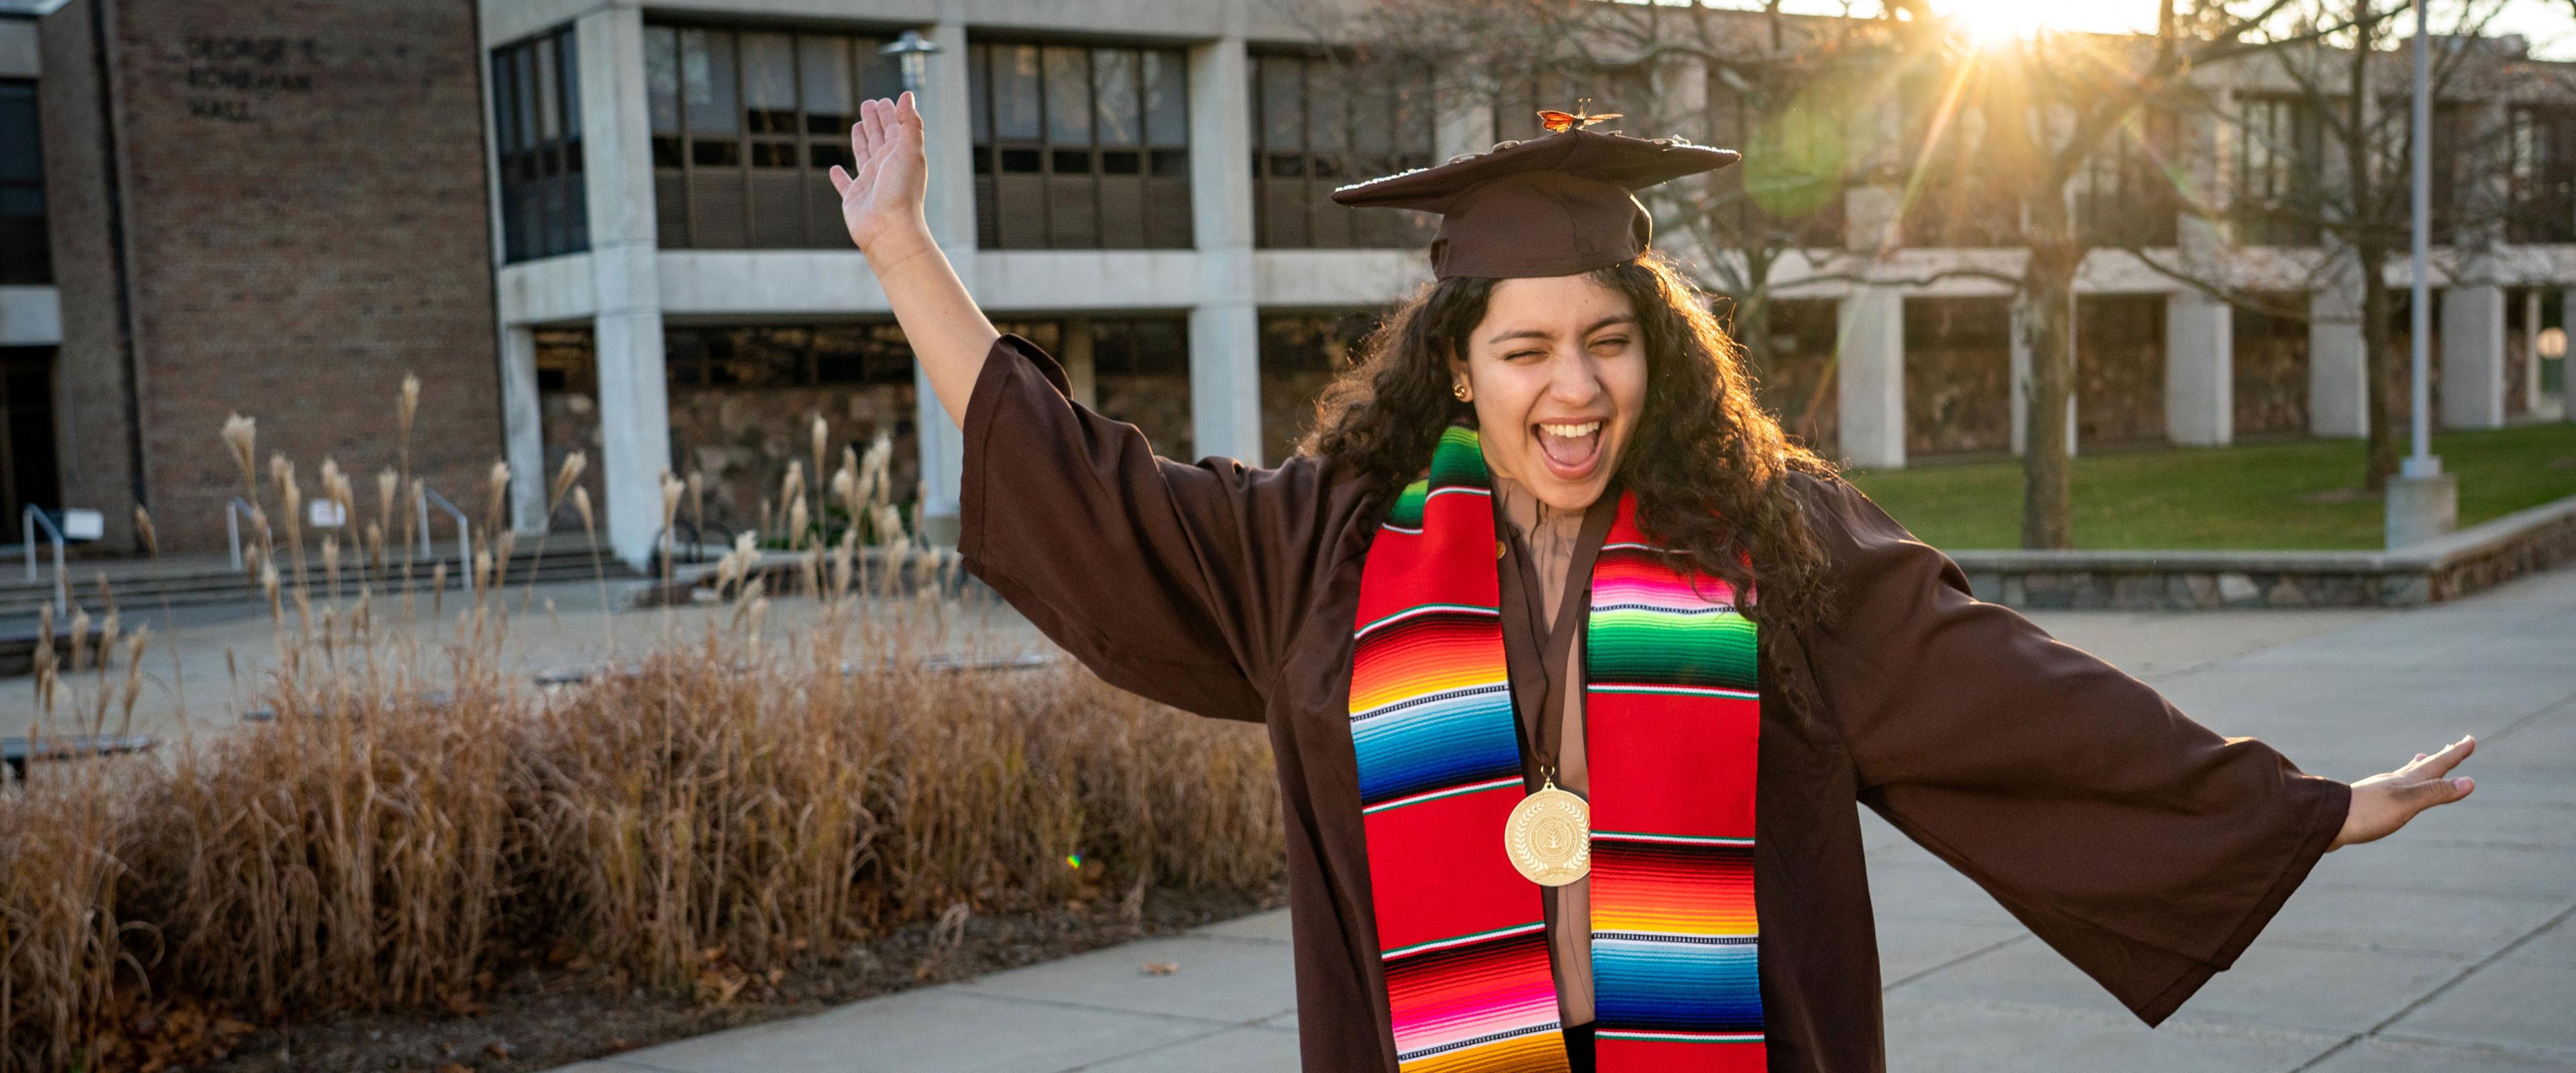 Valeria Marin celebrates graduating in her cap and gown.